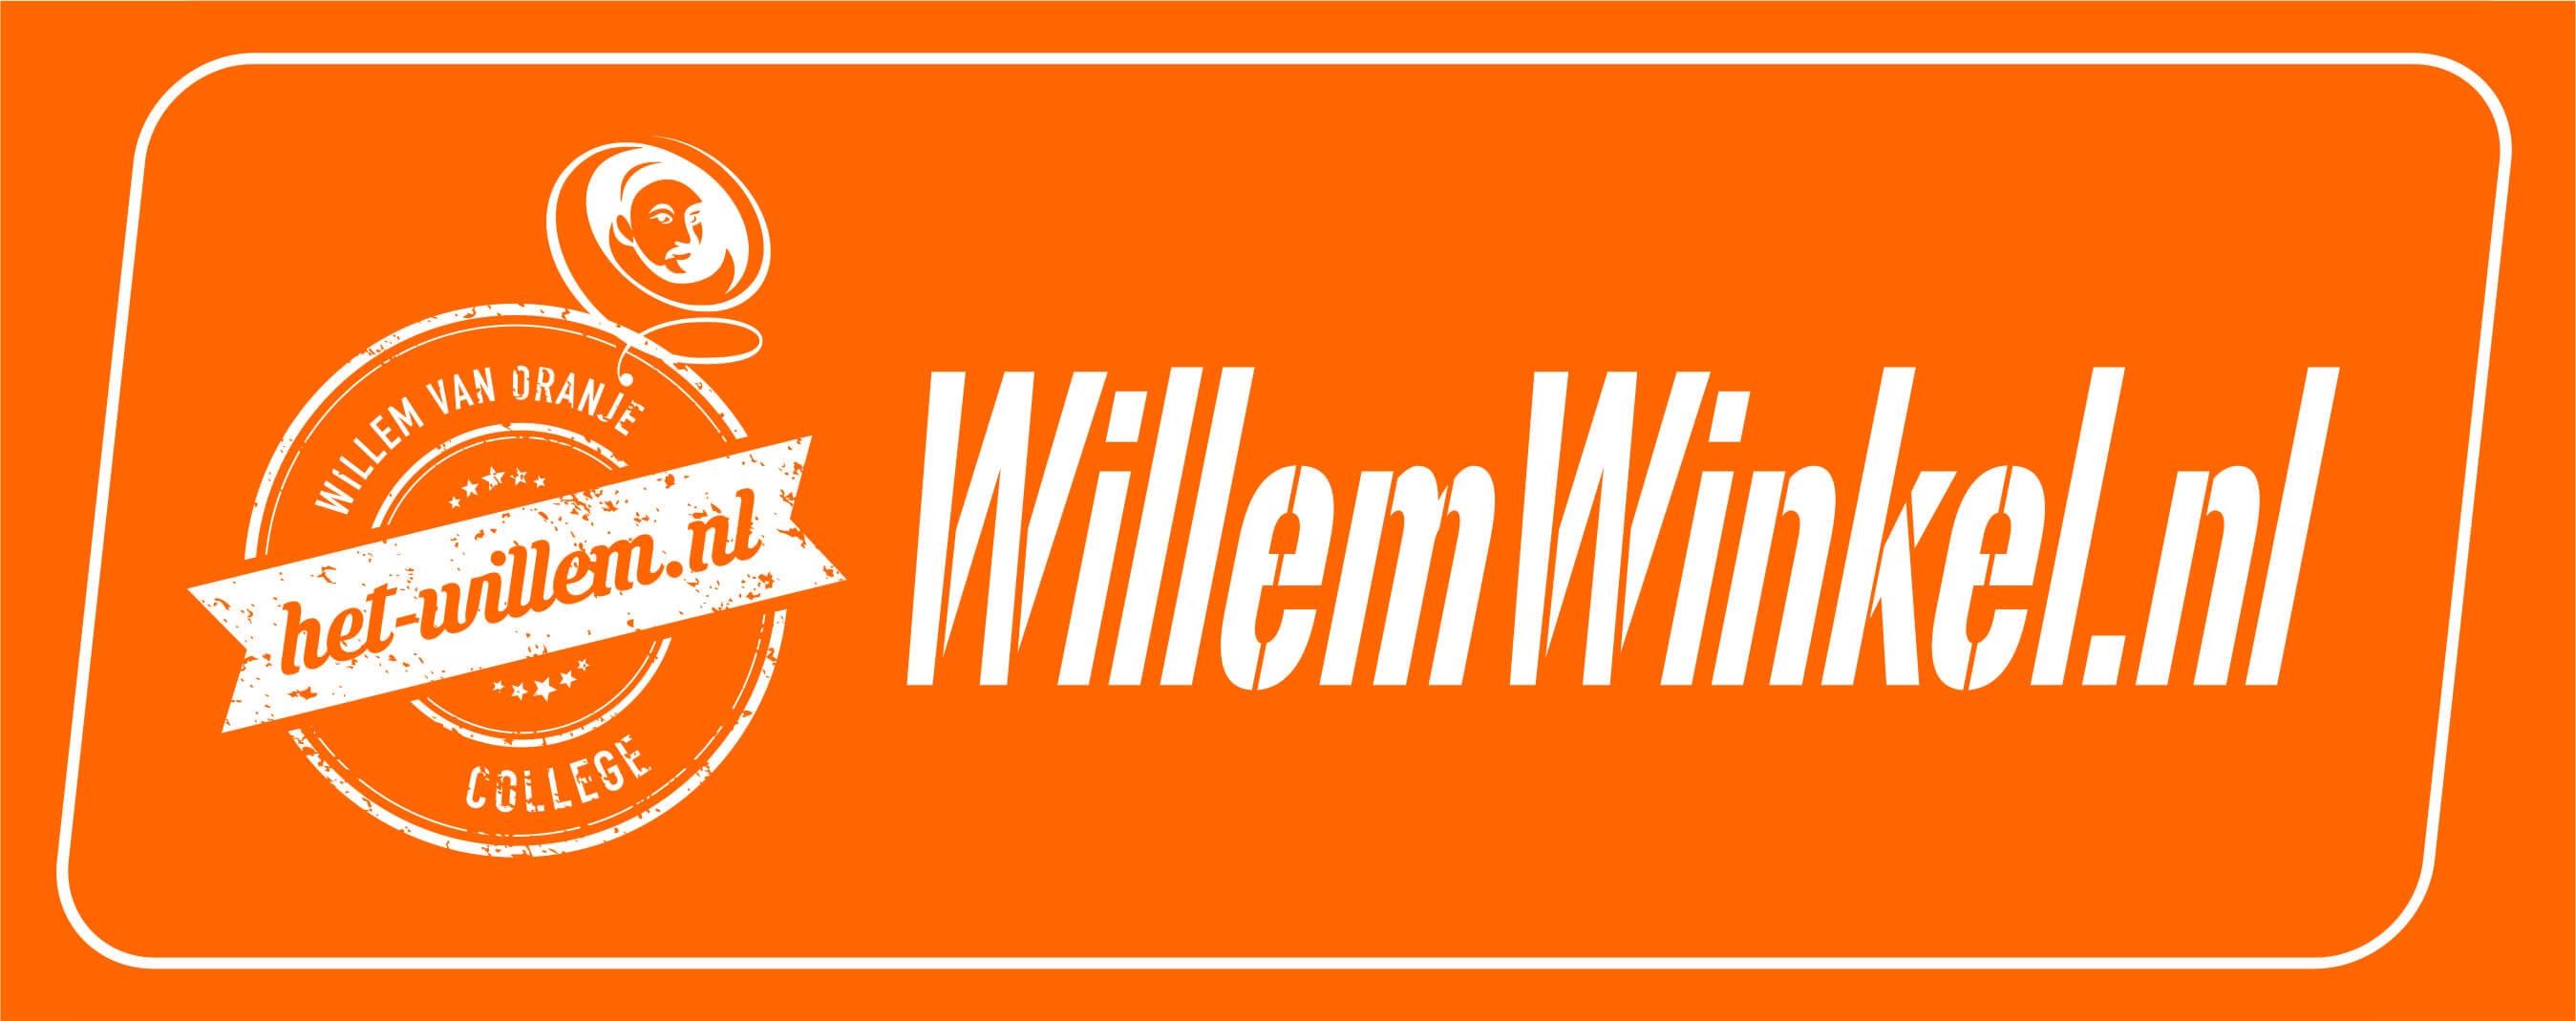 Willem Winkel